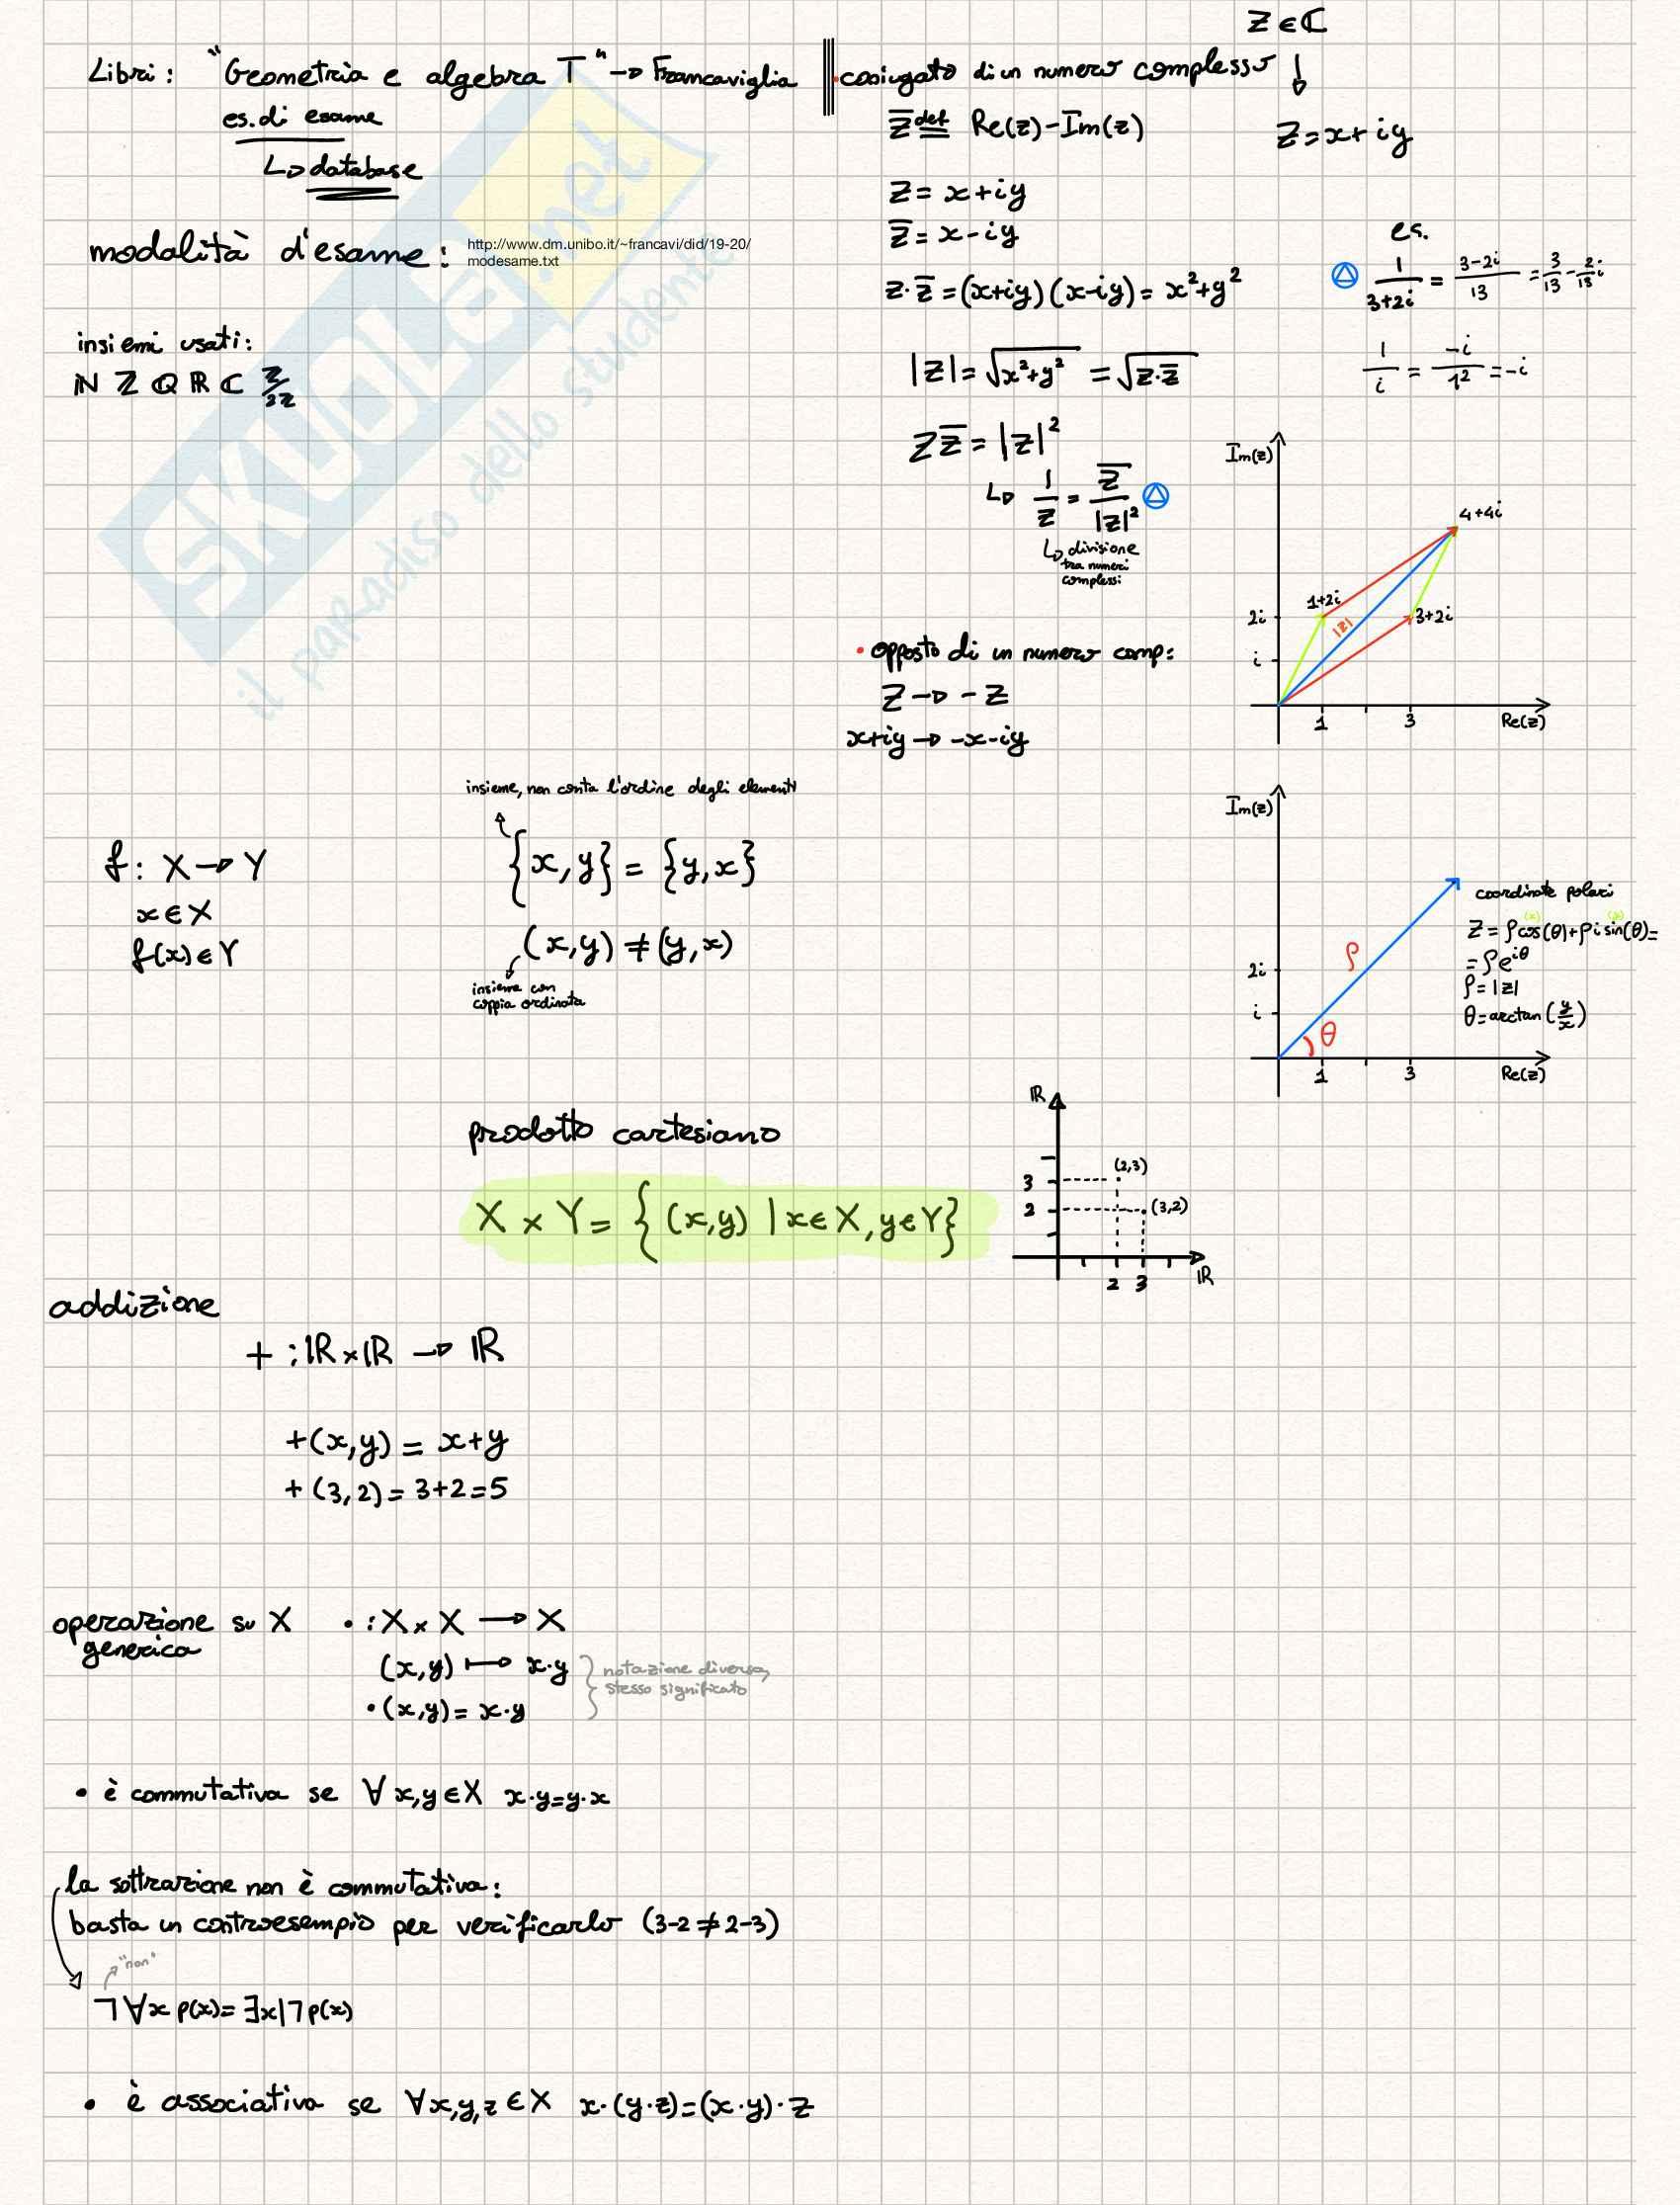 Appunti Geometria e Algebra T